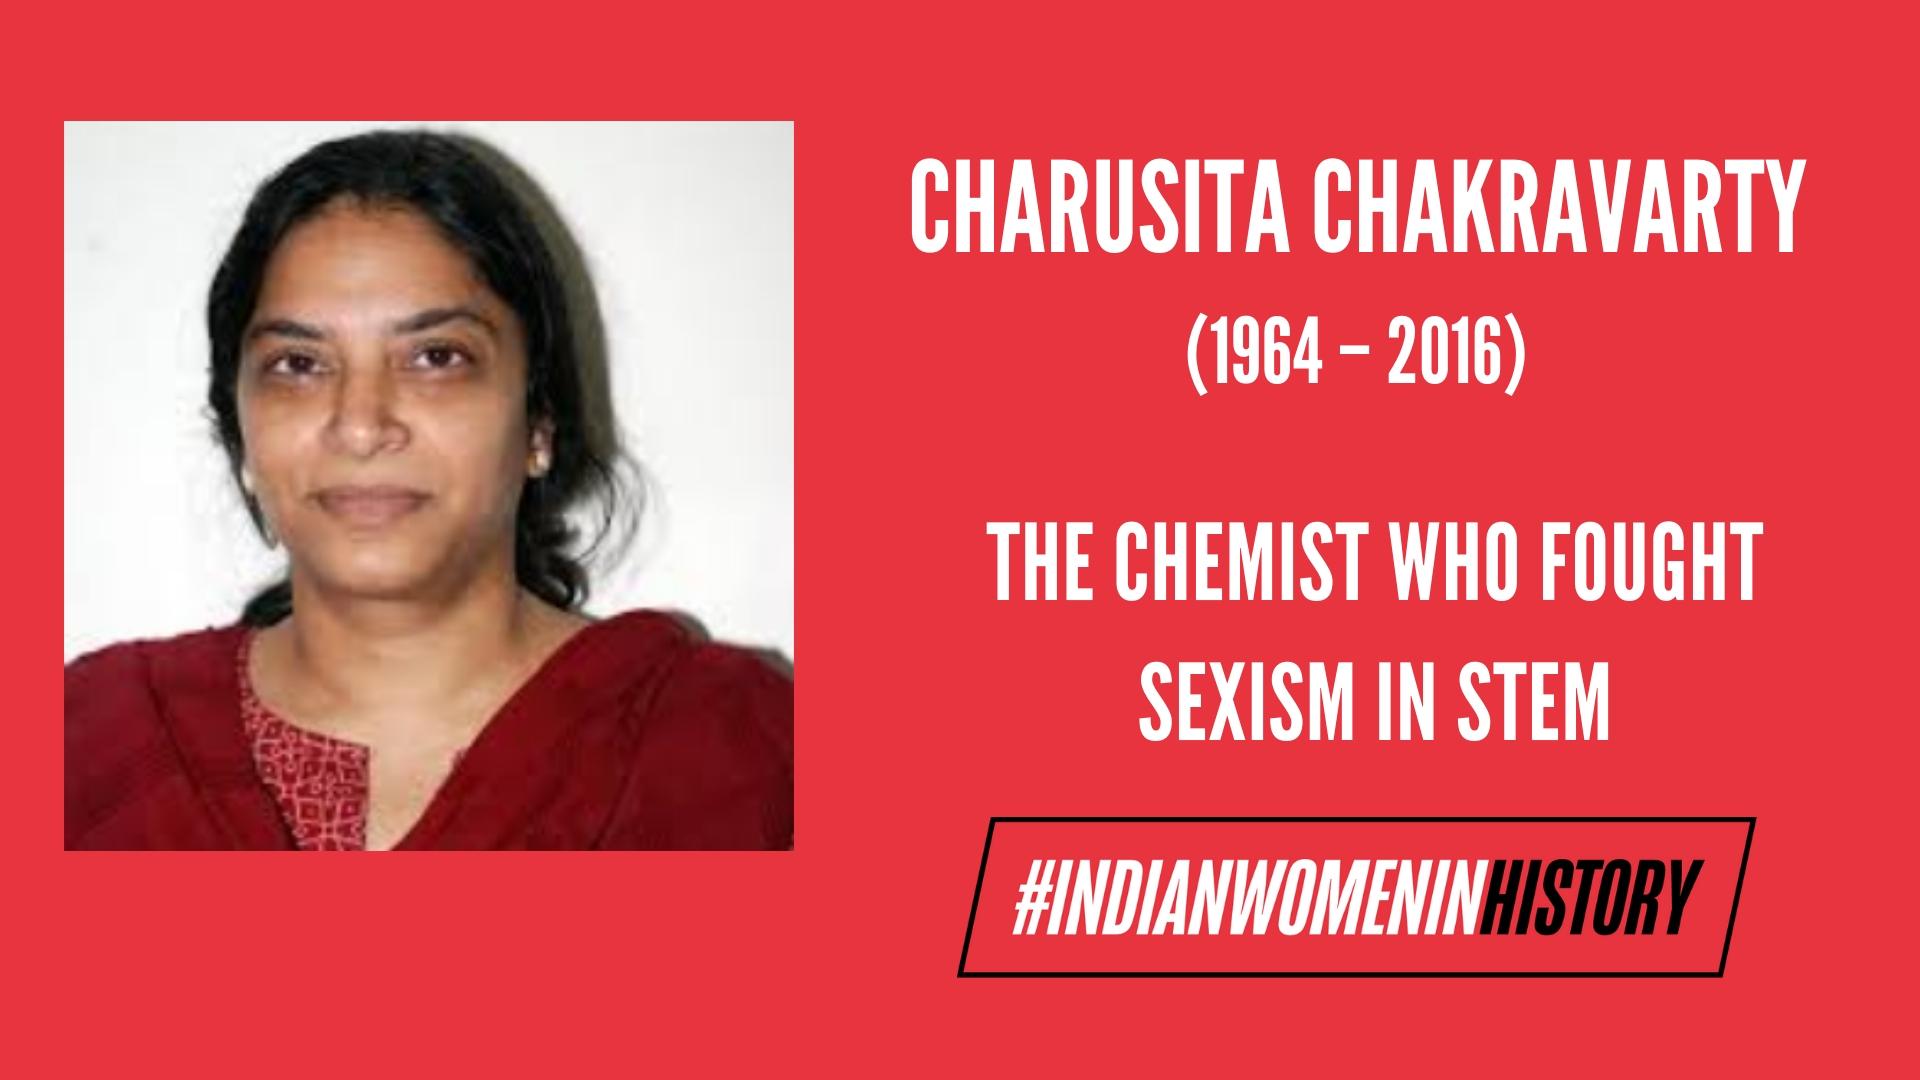 Charusita Chakravarty: The Chemist Who Fought Sexism In STEM|#IndianWomenInHistory